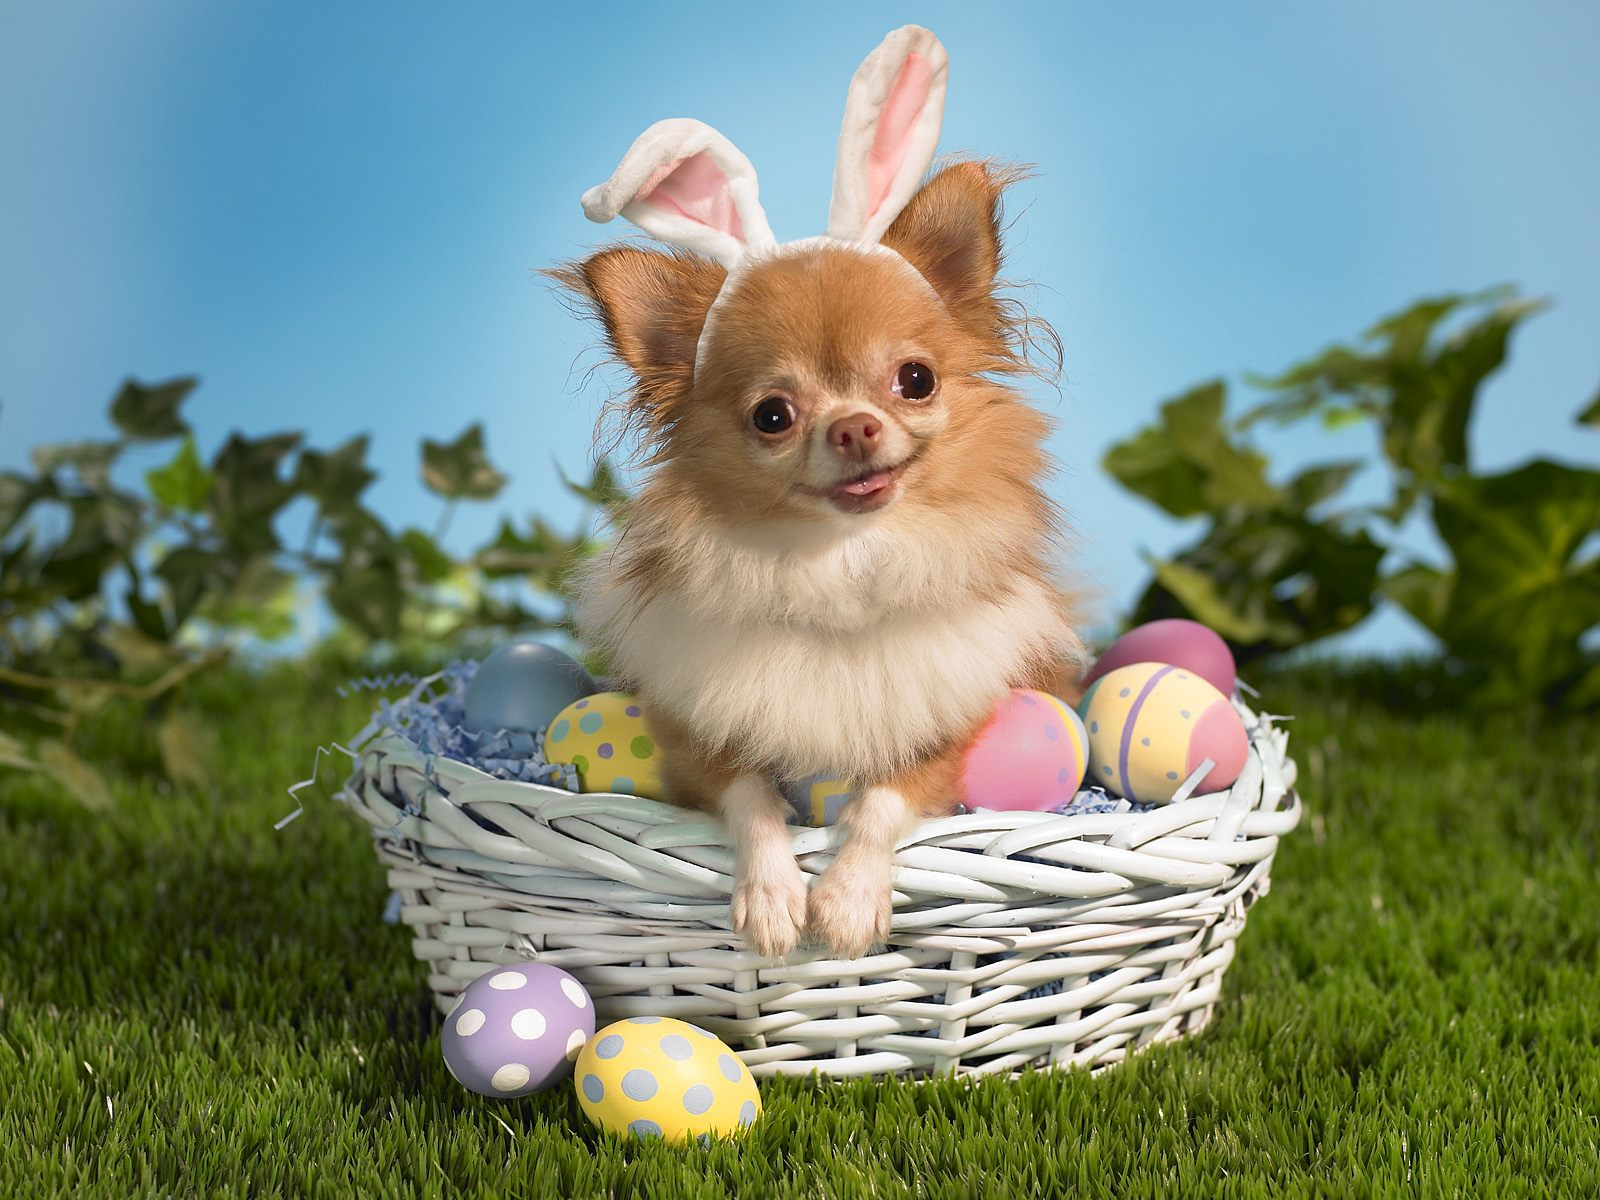 Happy Easter inotternewscom 1600x1200